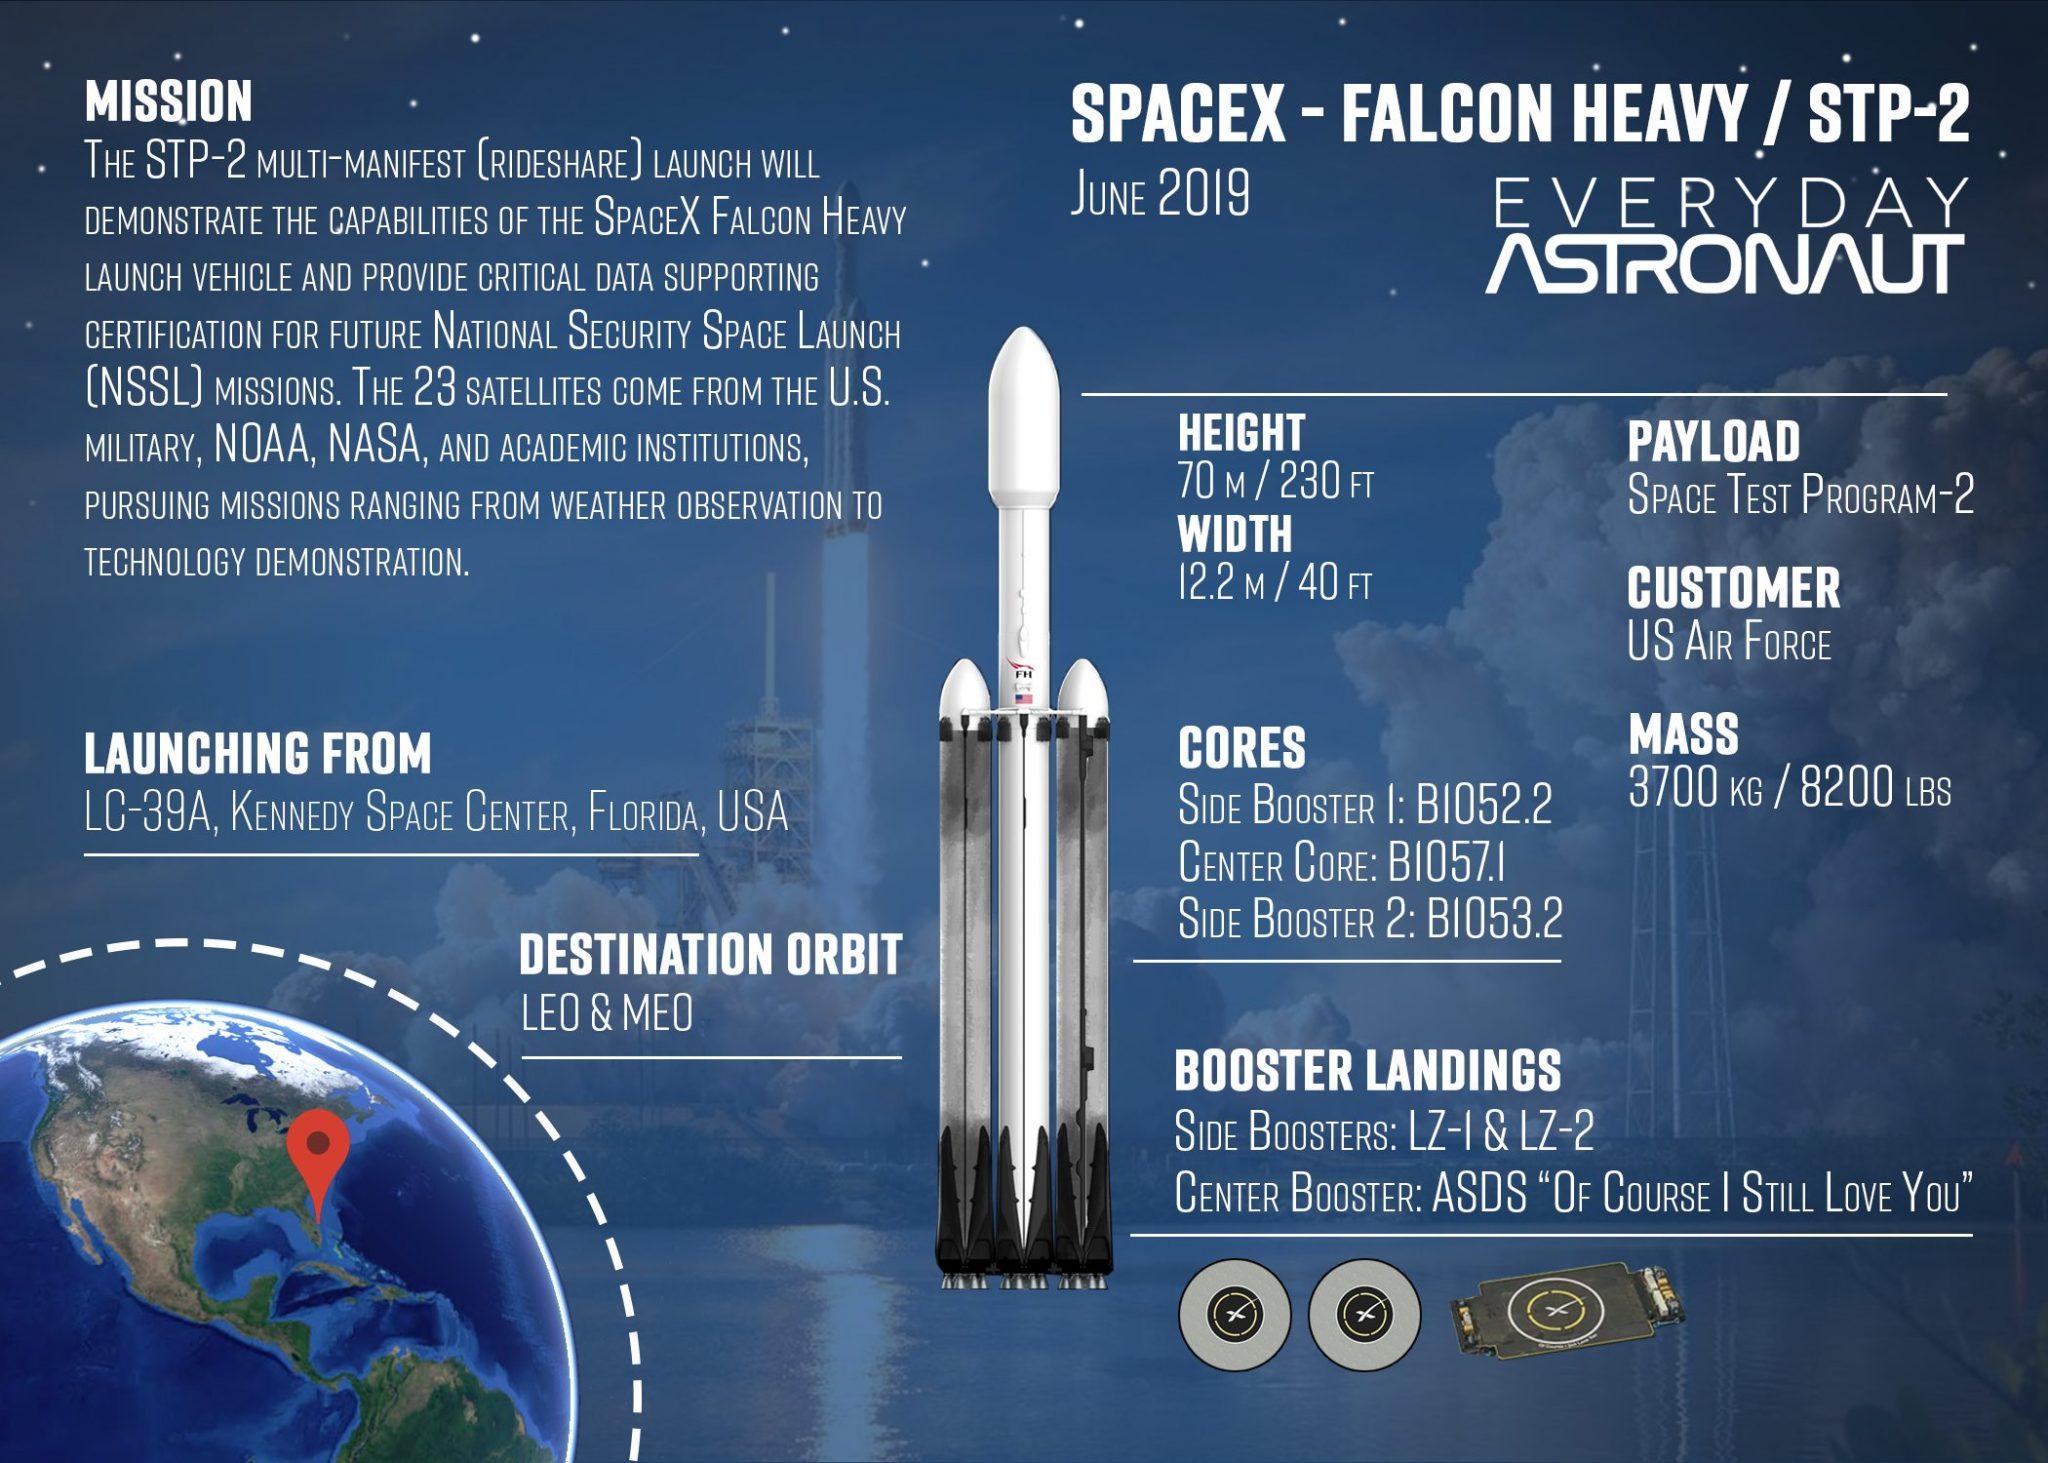 Prelaunch Preview - Falcon Heavy | STP-2 - Everyday Astronaut